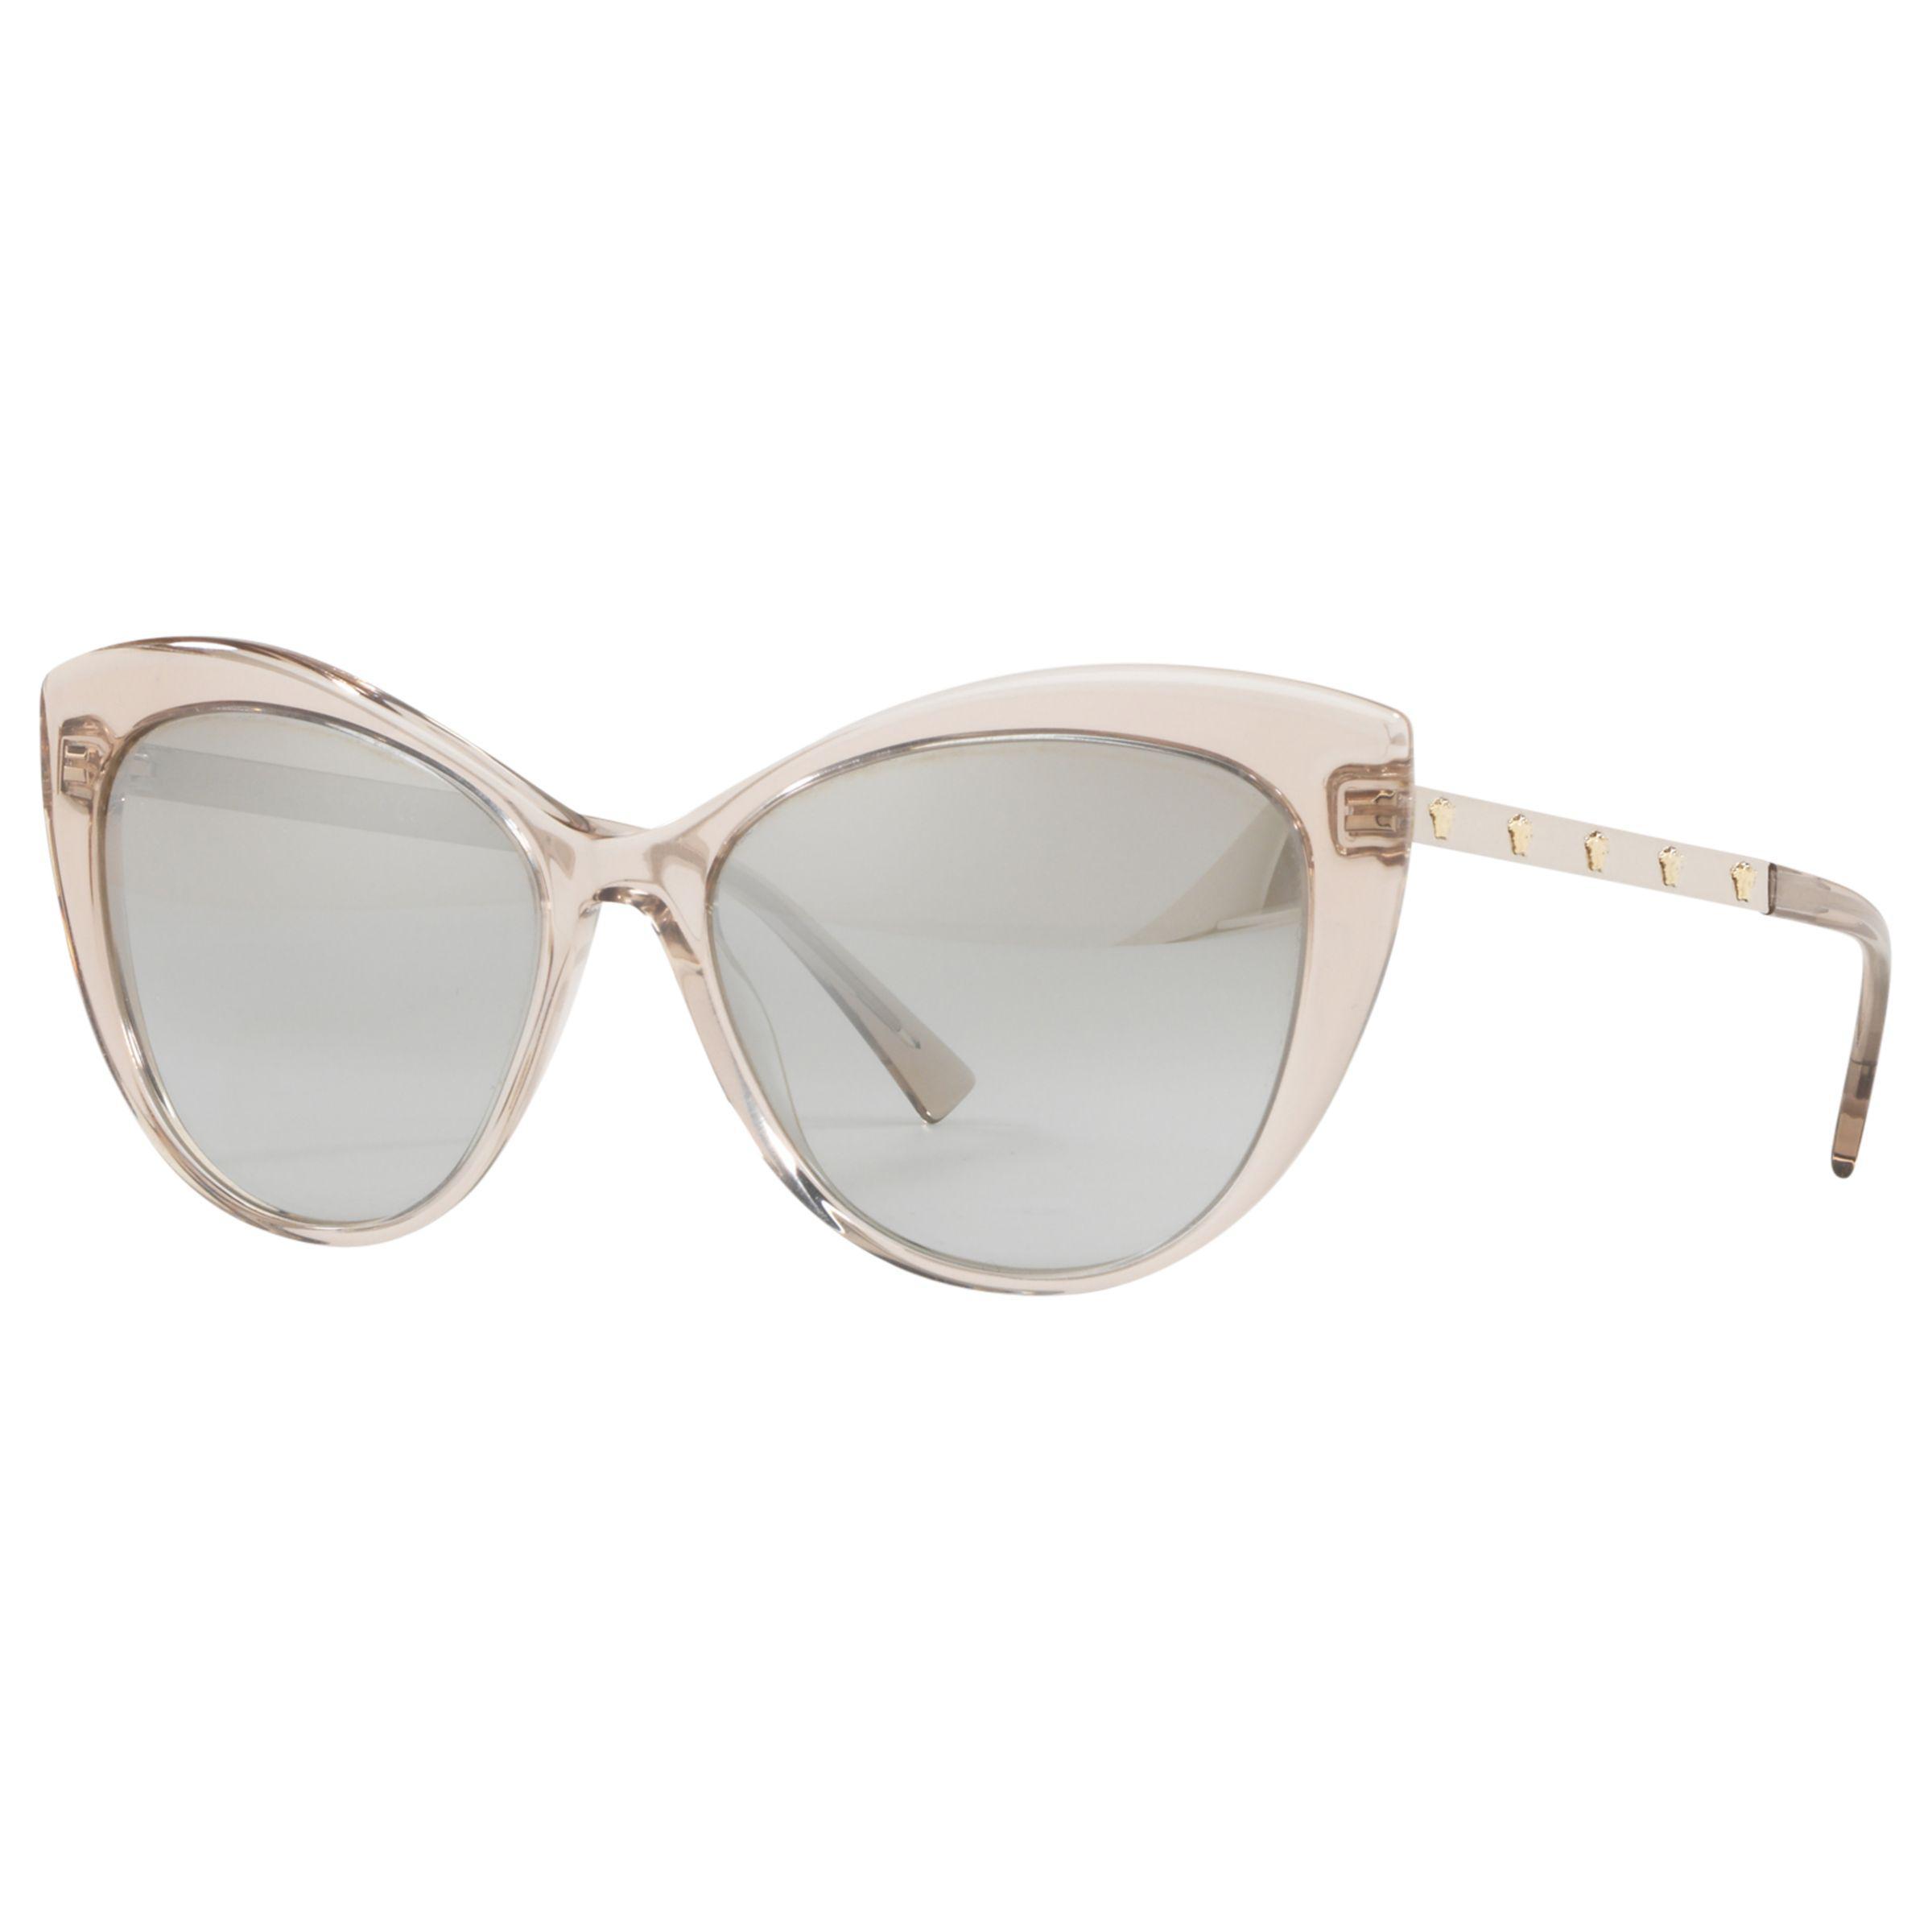 f6894f5faf Versace Ve4348 Cat s Eye Sunglasses in Metallic - Lyst